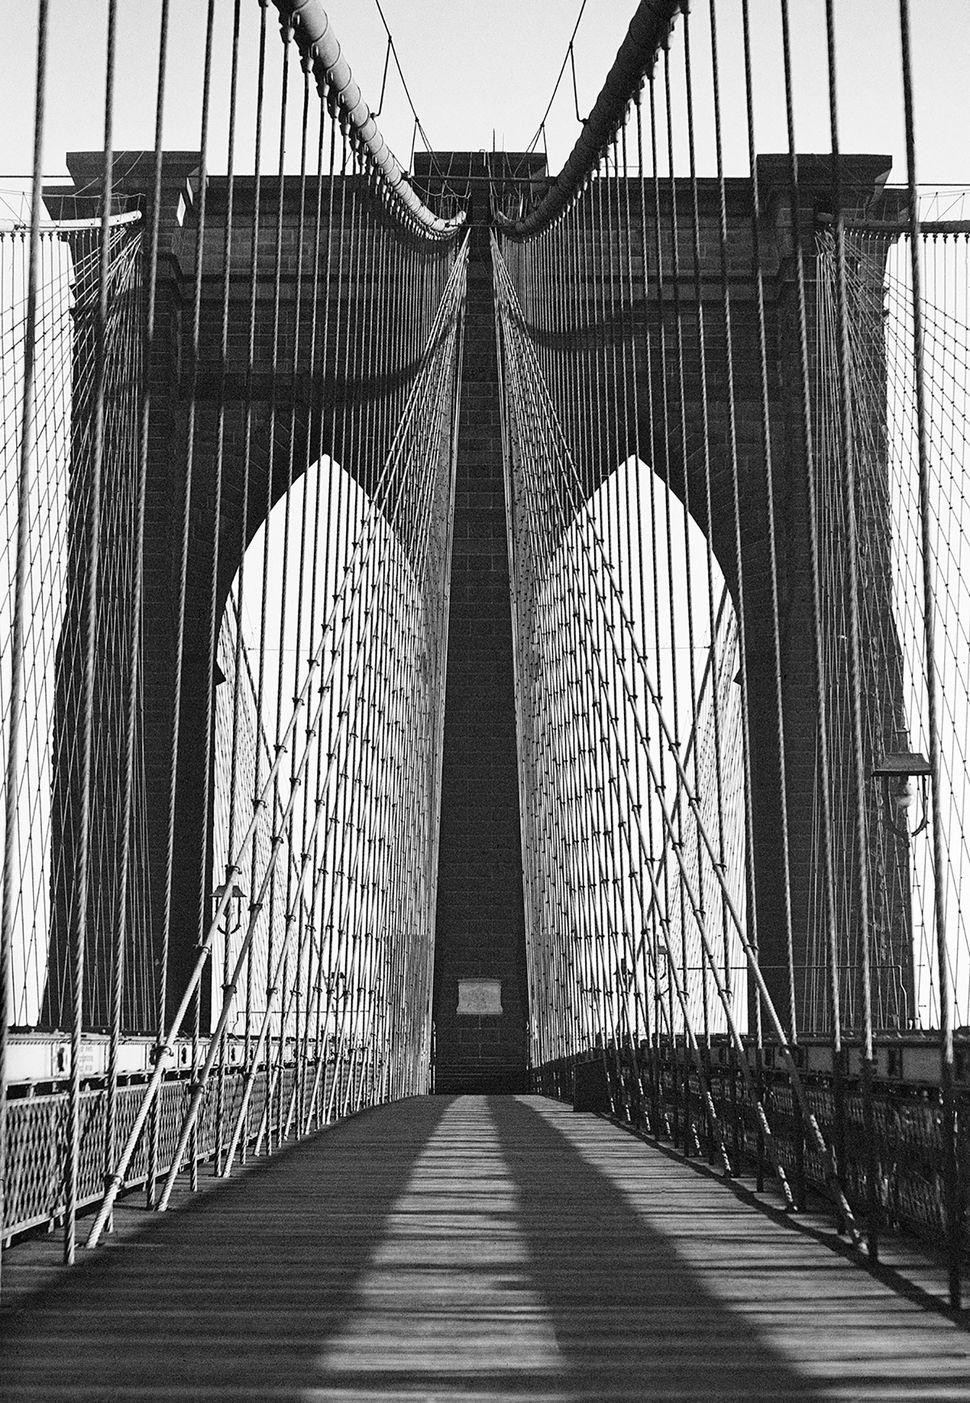 Harold Roth, Brooklyn Bridge, 1945, Gelatin silver print, Photograph courtesy of Anton A